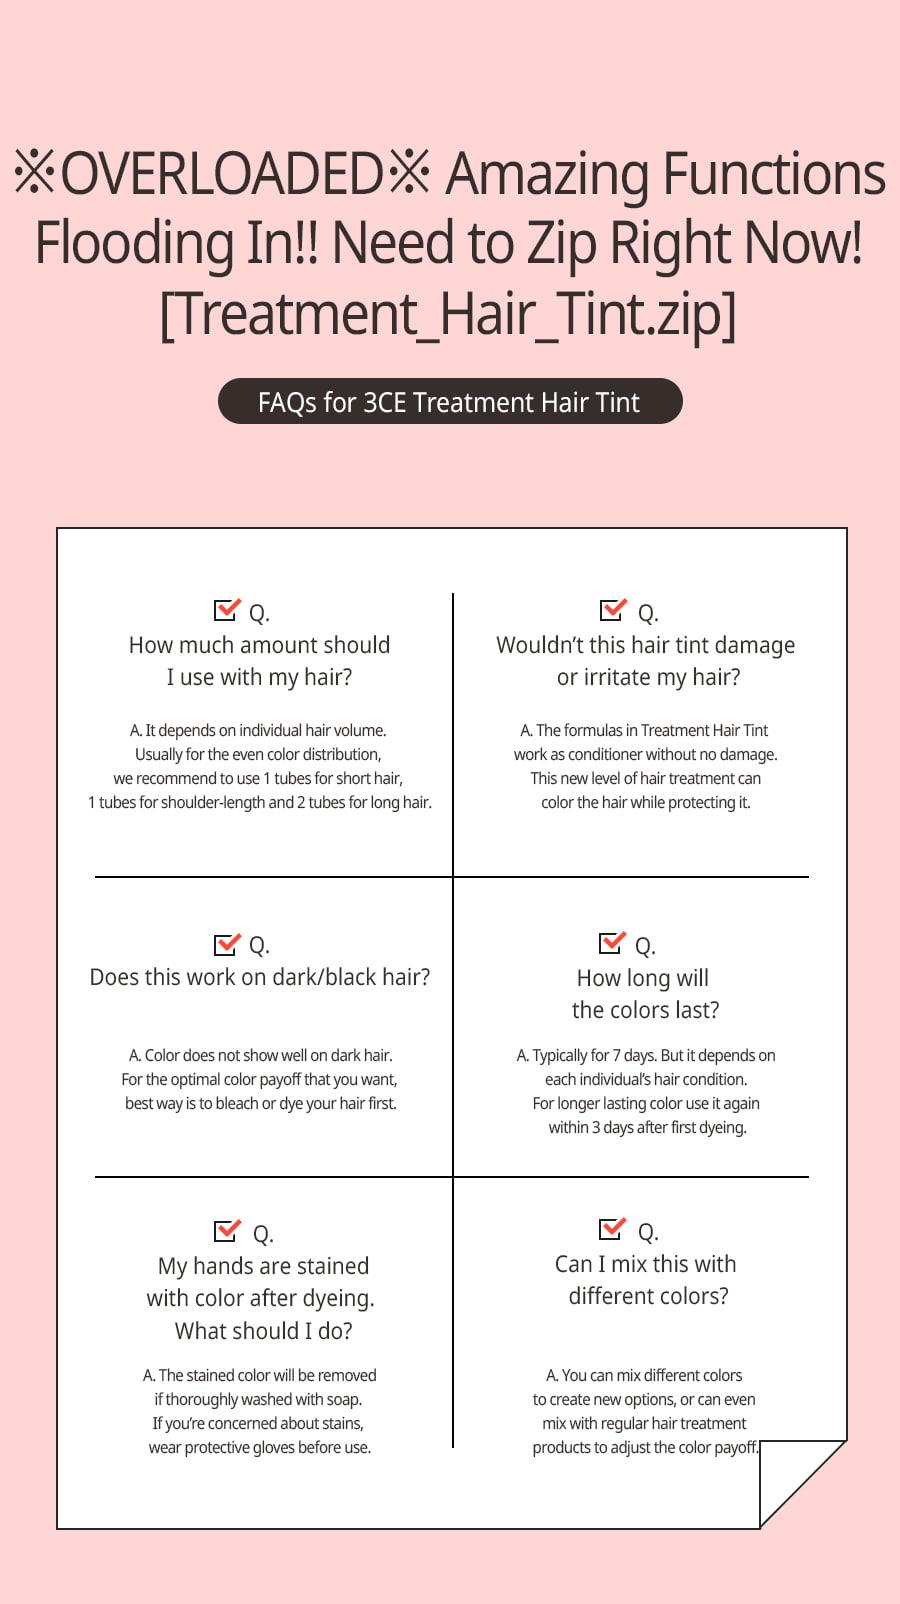 Thuốc Nhuộm Tóc Tạm Thời 3CE Treatment Hair Tint